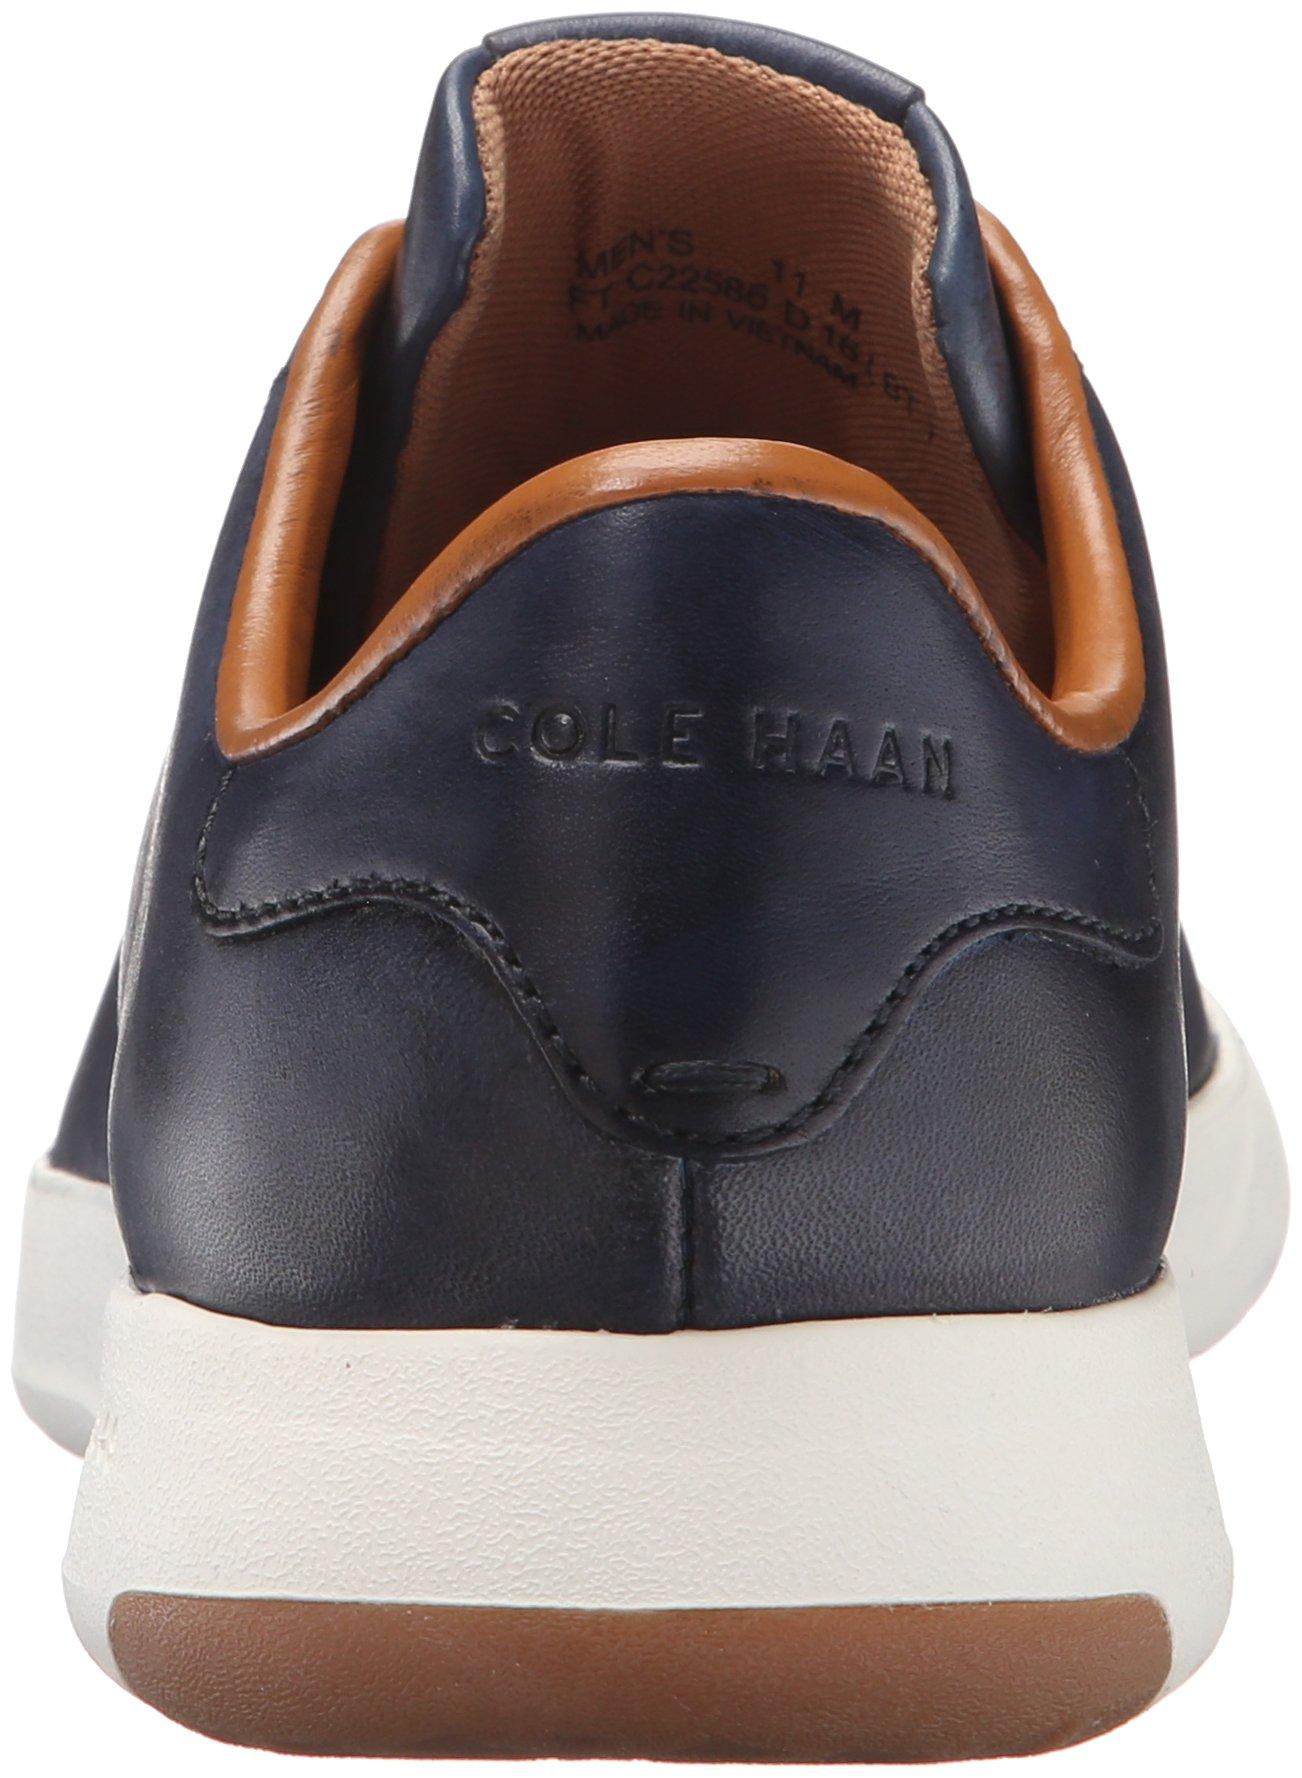 Cole Haan Men's Grandpro Tennis Fashion Sneaker, Blazer Blue Hand Stain, 7 M US by Cole Haan (Image #2)